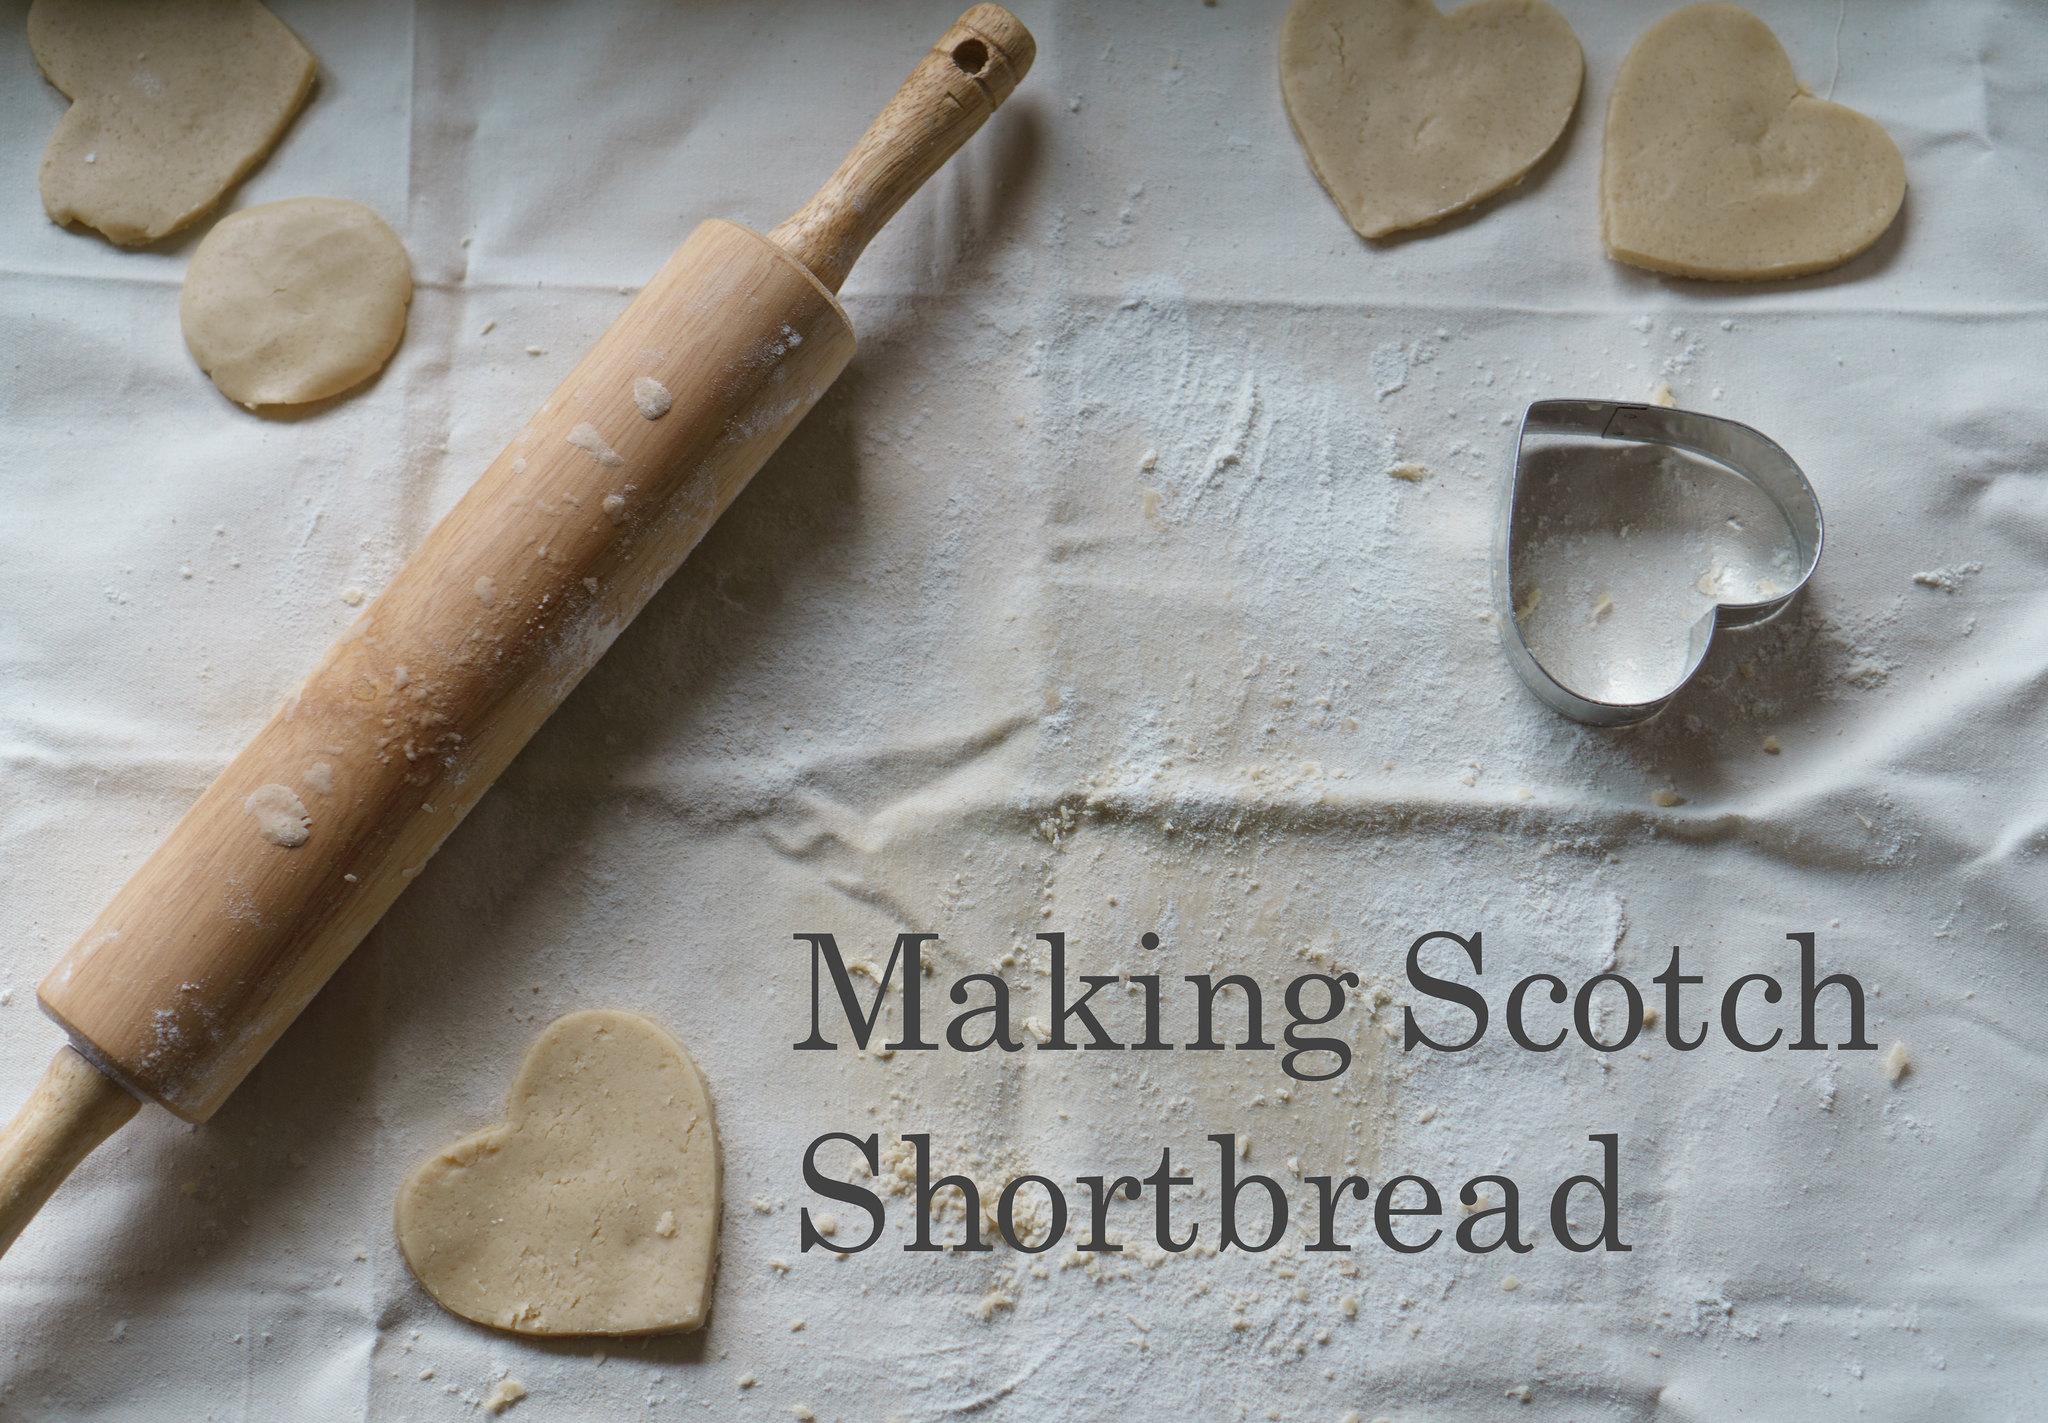 Making Scotch Shortbread